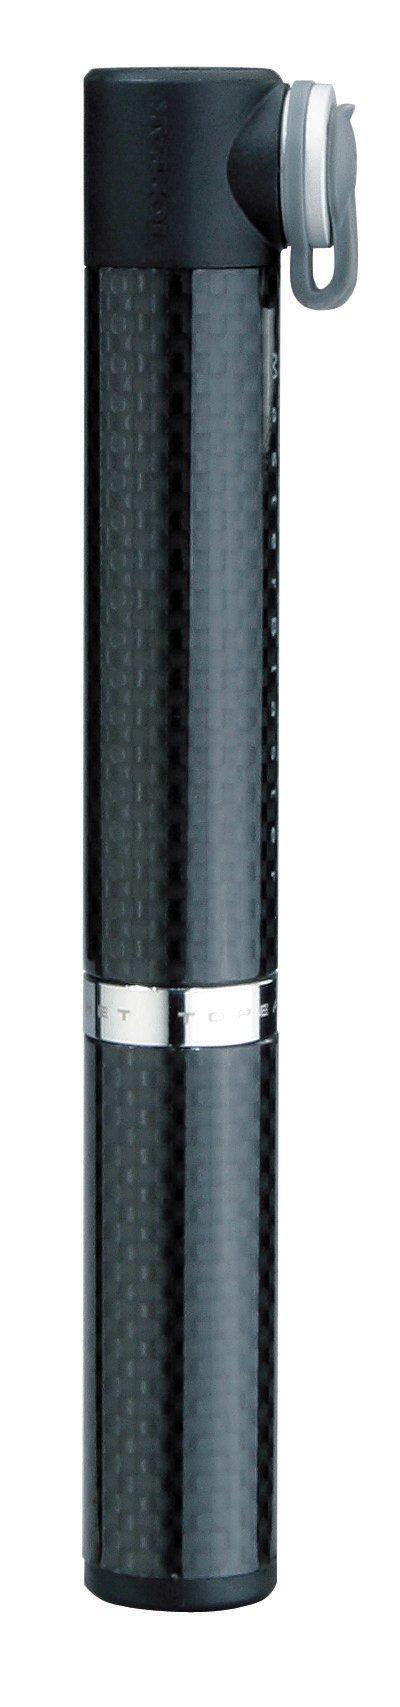 Topeak Micro Rocket CB MasterBlaster Carbon Fiber Bike Pump